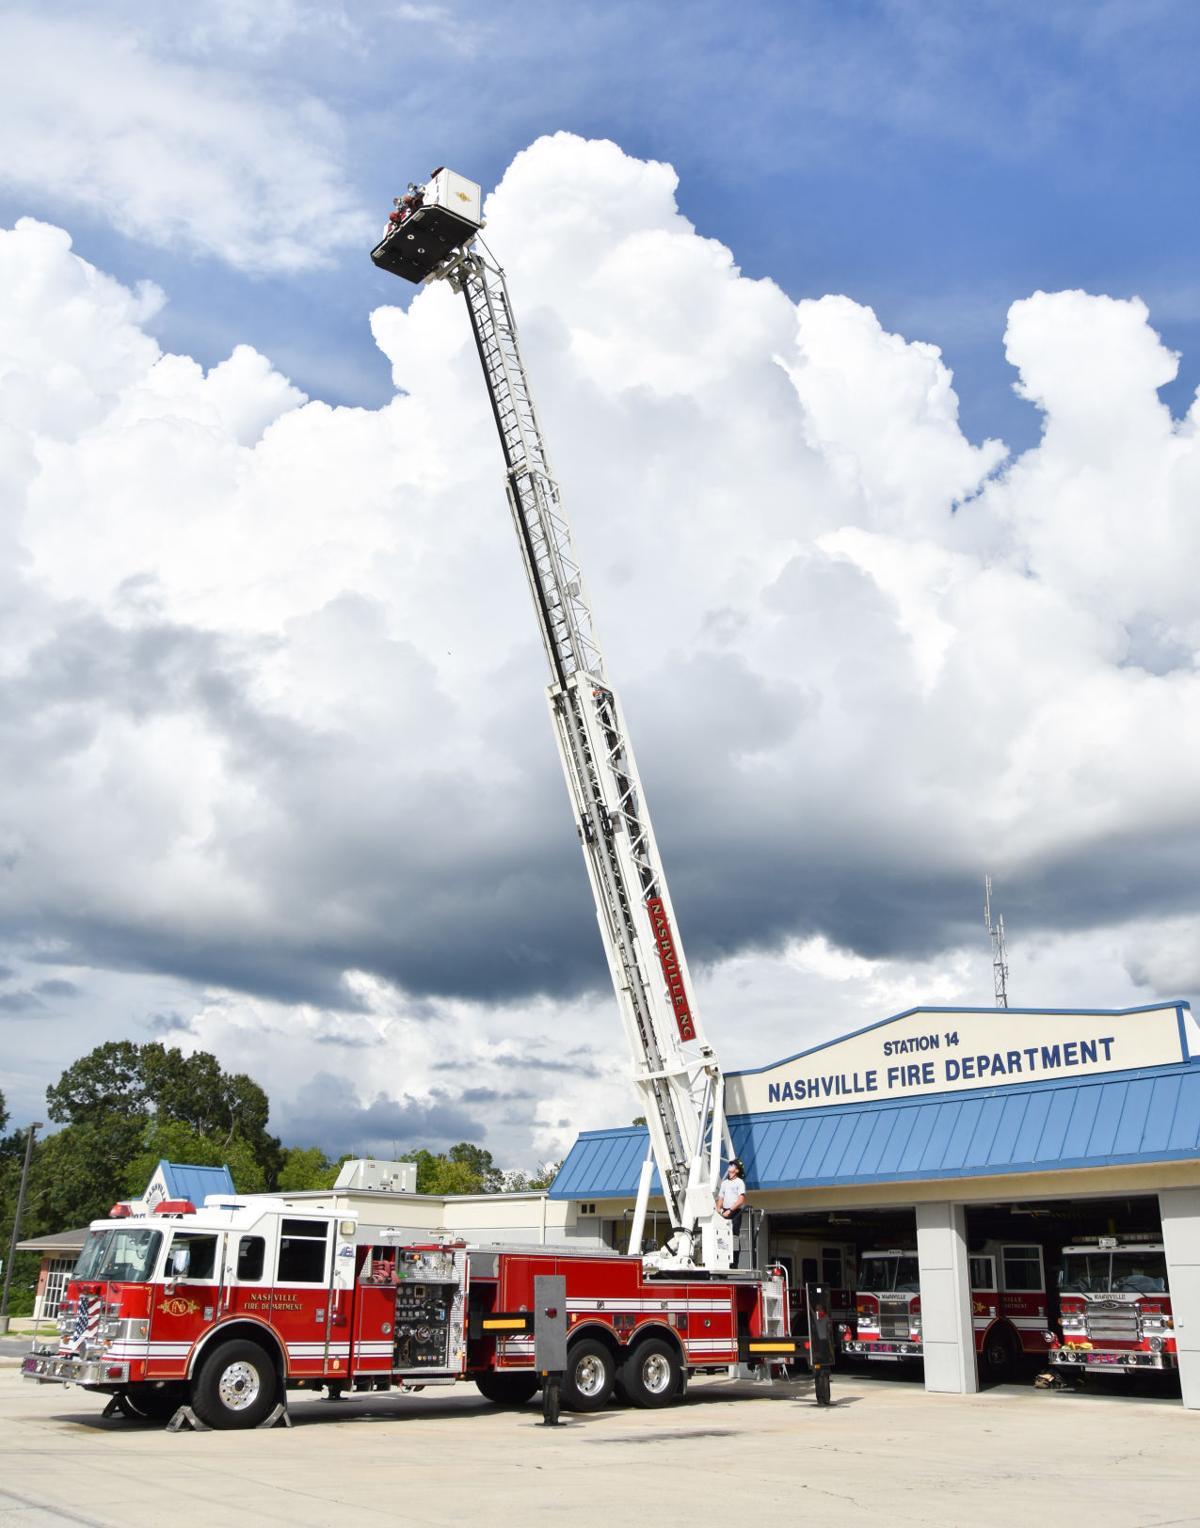 Nashville Fire Department 2